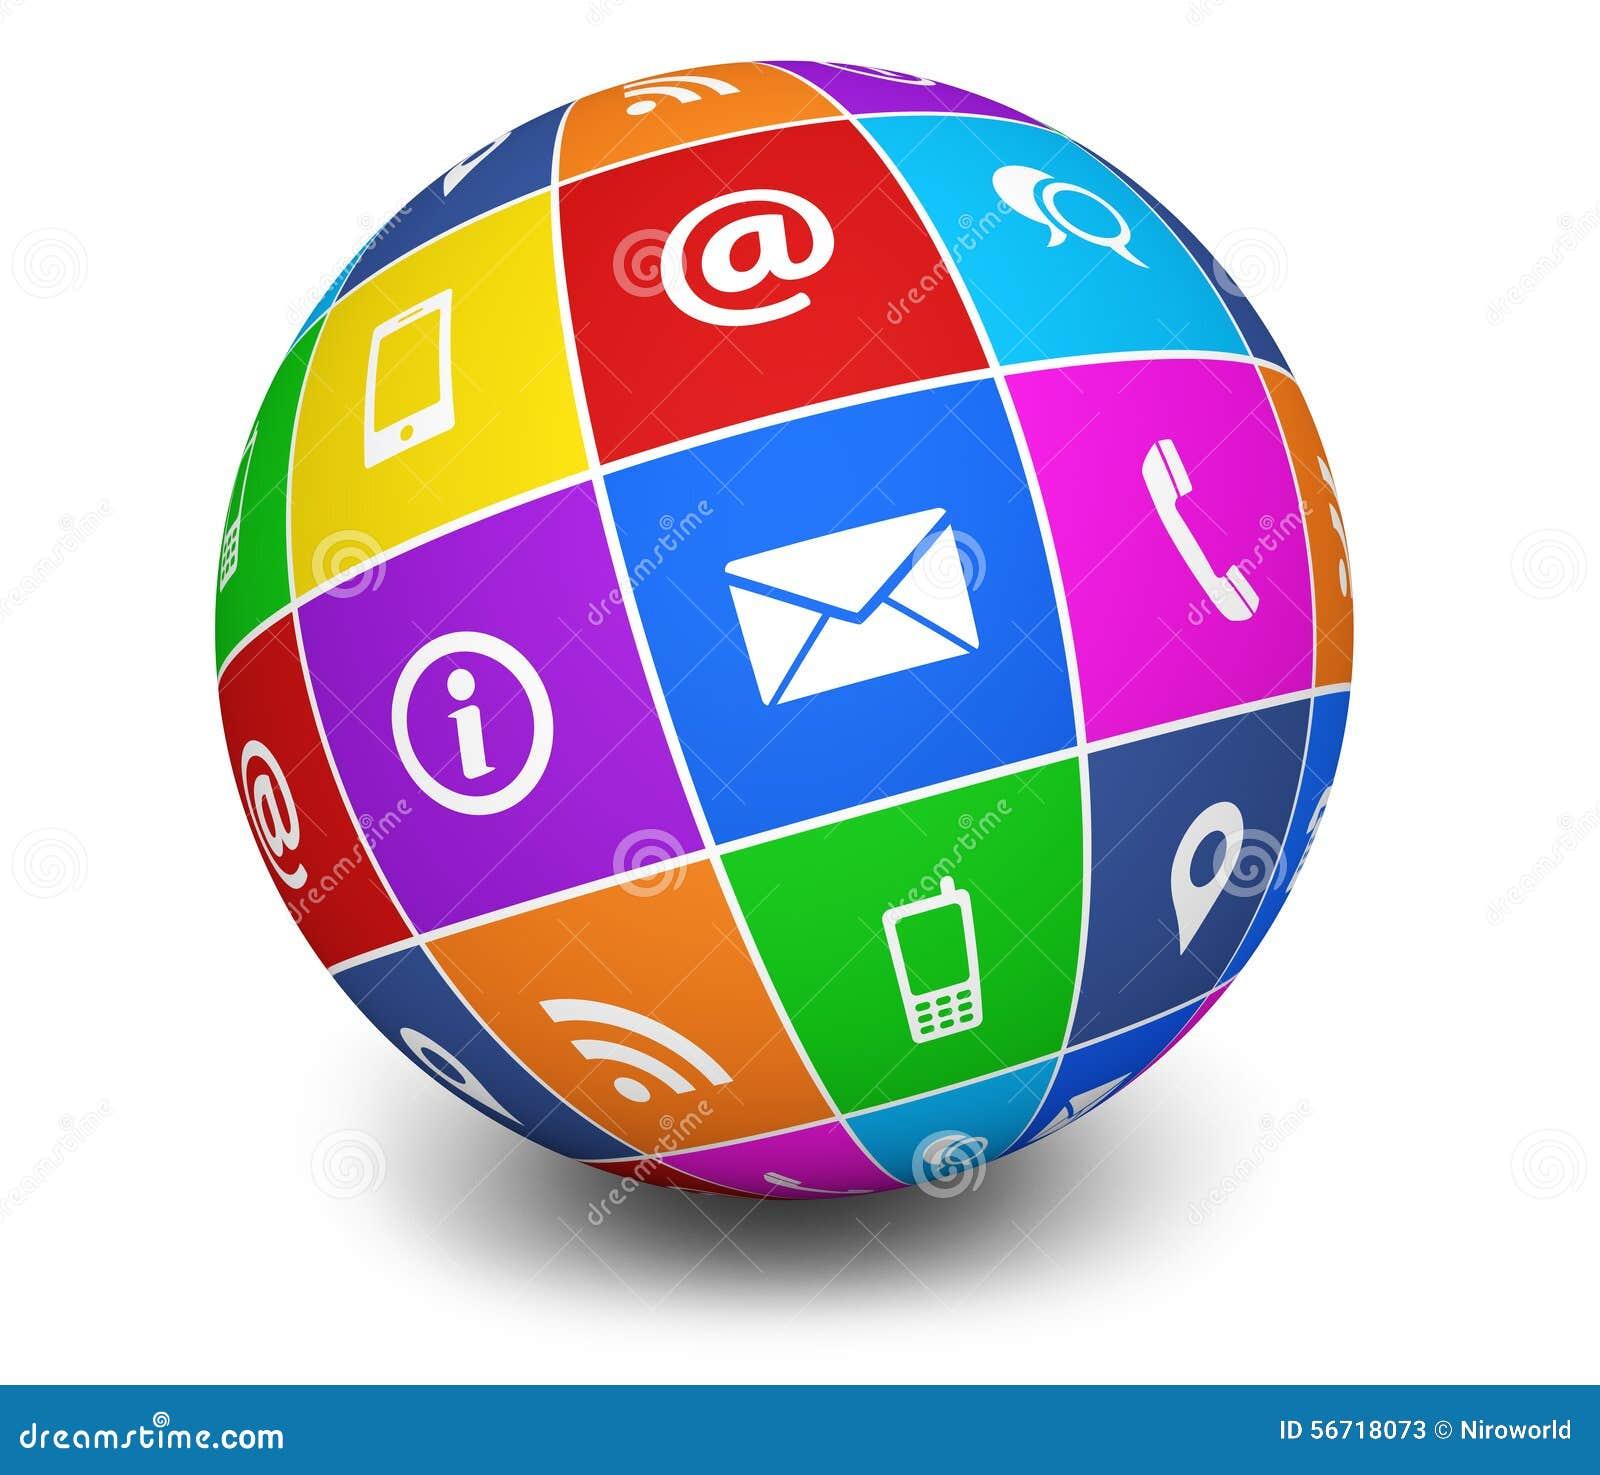 List of Top Websites on Tyco